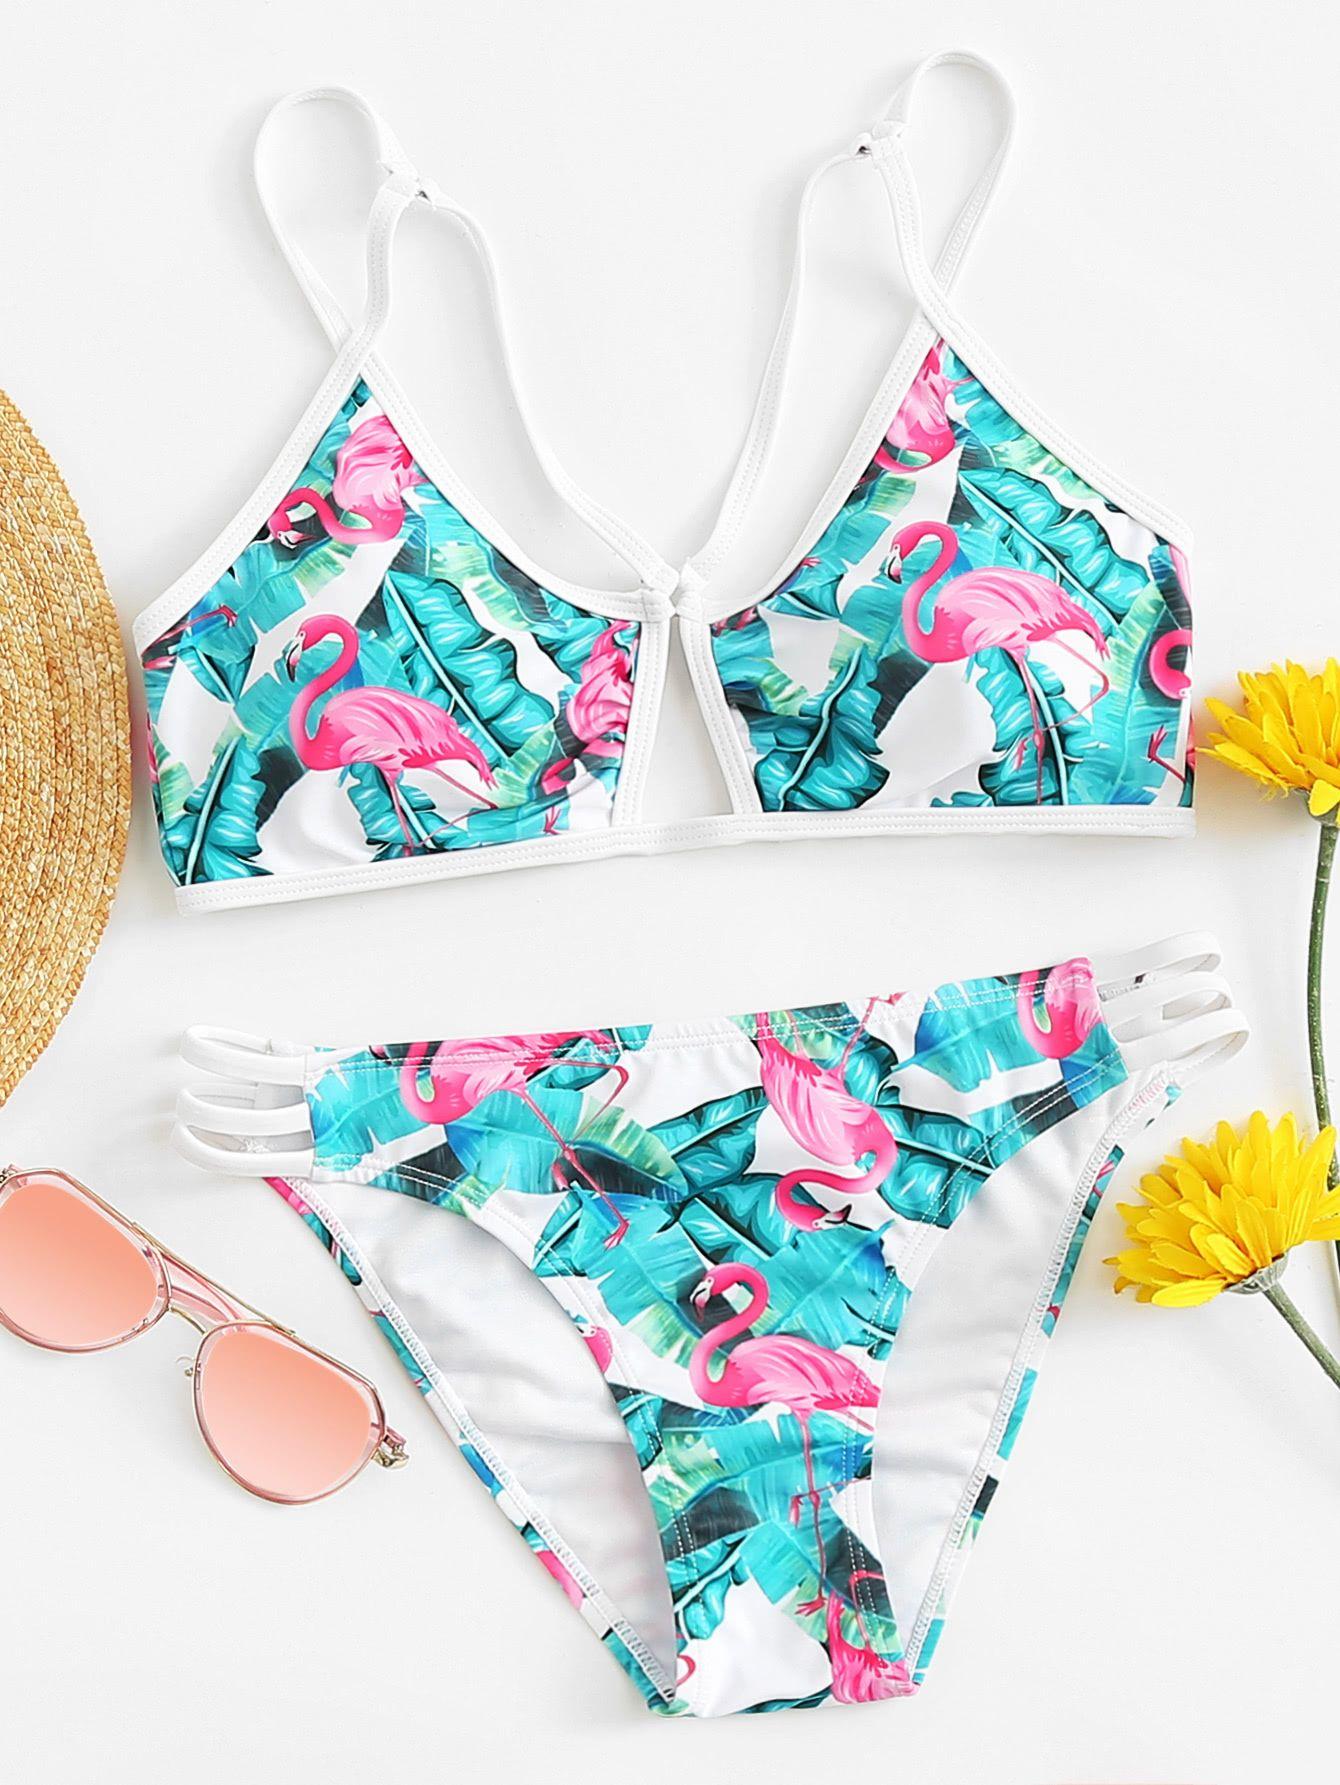 6912aaf3c22 Mimfor Fashion Women's Ladies Vintage Lace Bikini Sets Beach Swimwear  Bathing Suit Clothing